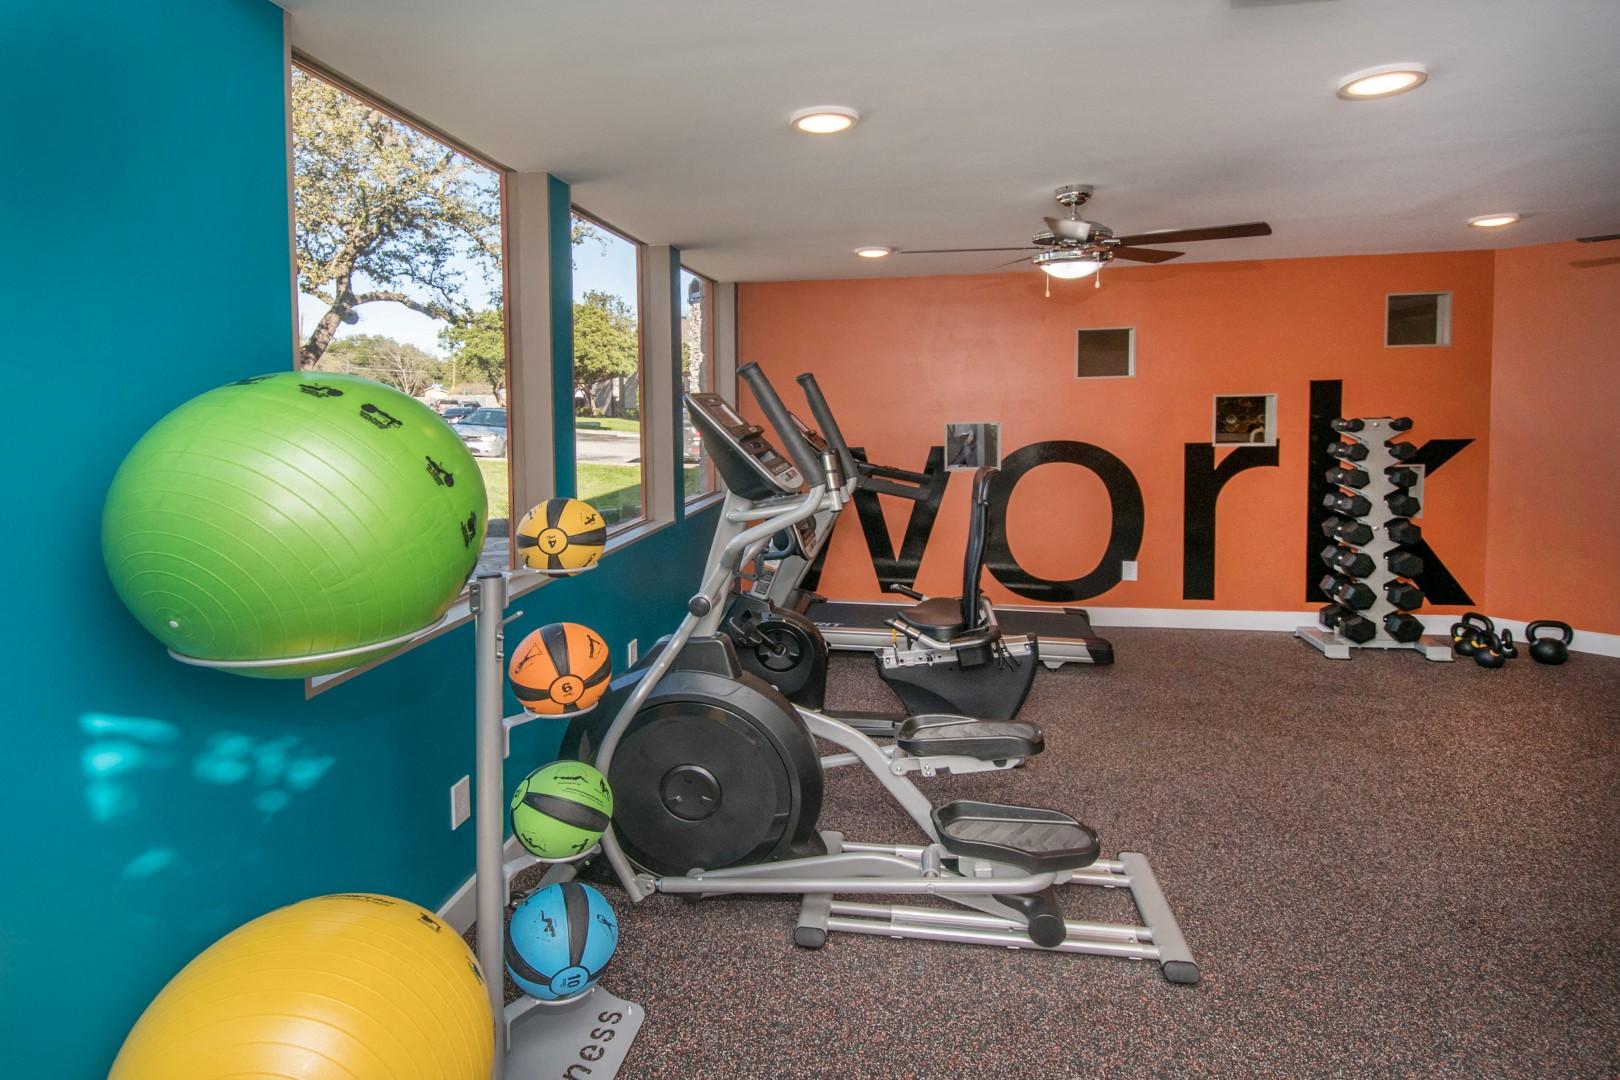 northwest san antonio apartments with a fitness center